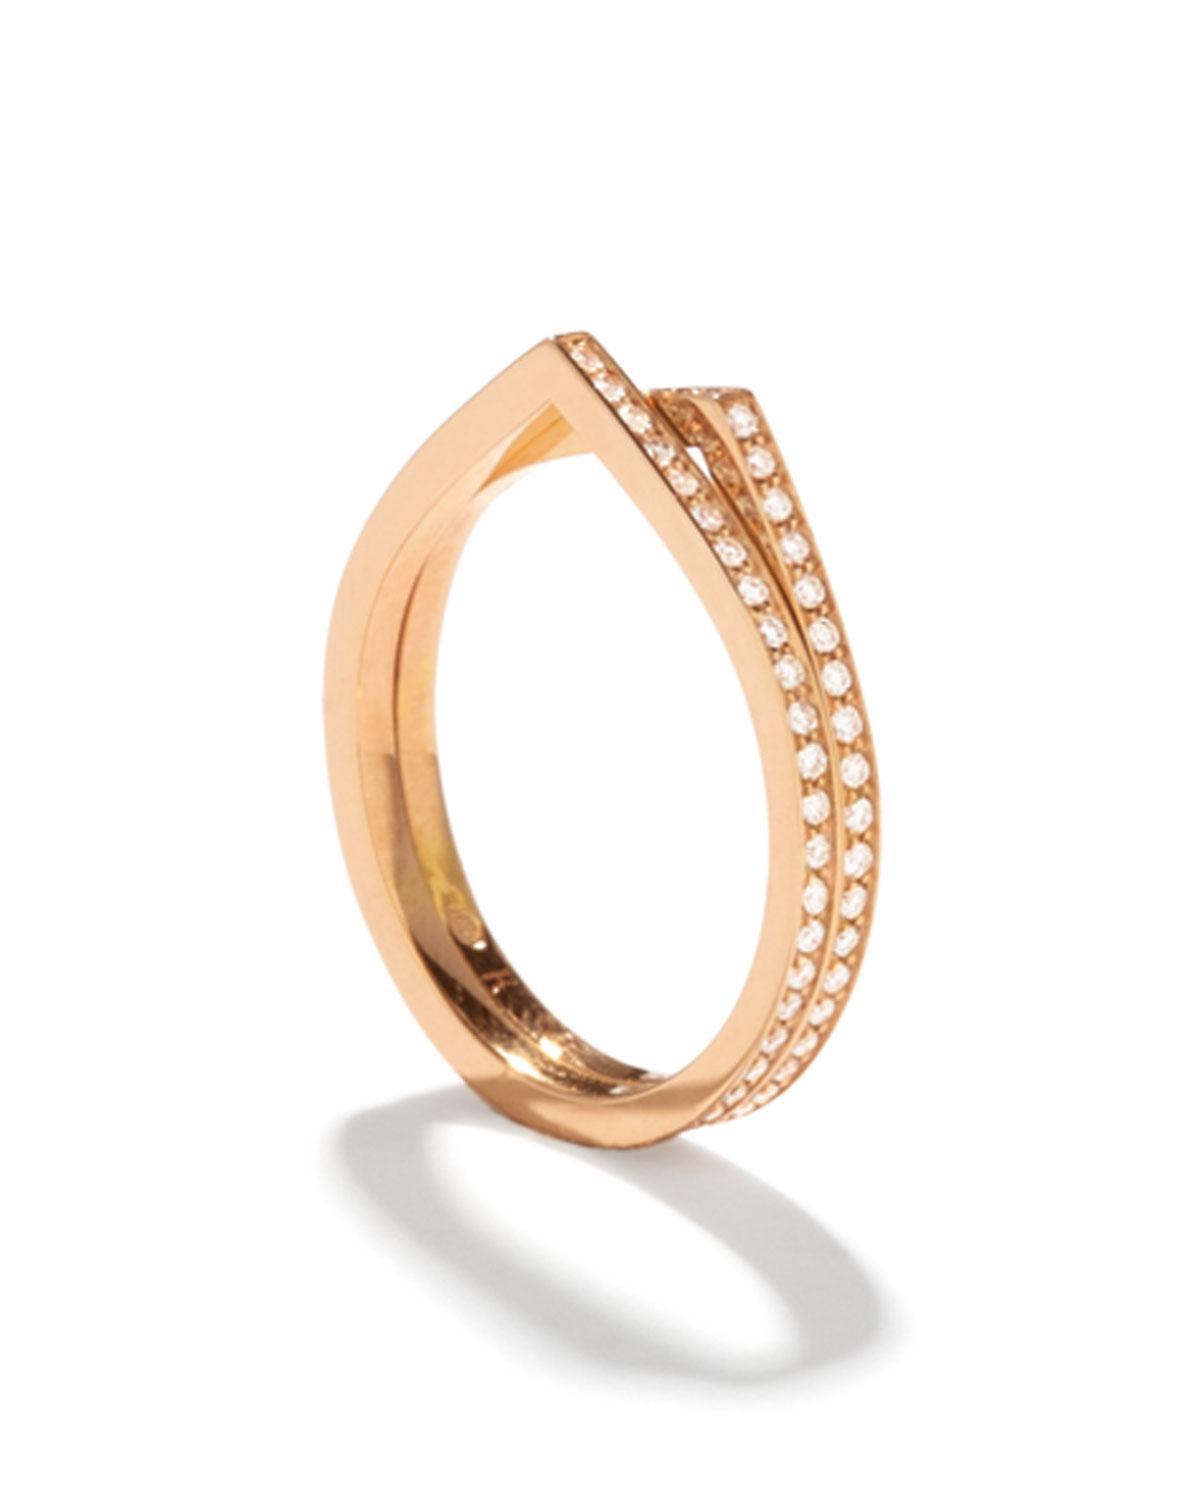 Repossi Antifer Ring in 18K Gold XLzdgI